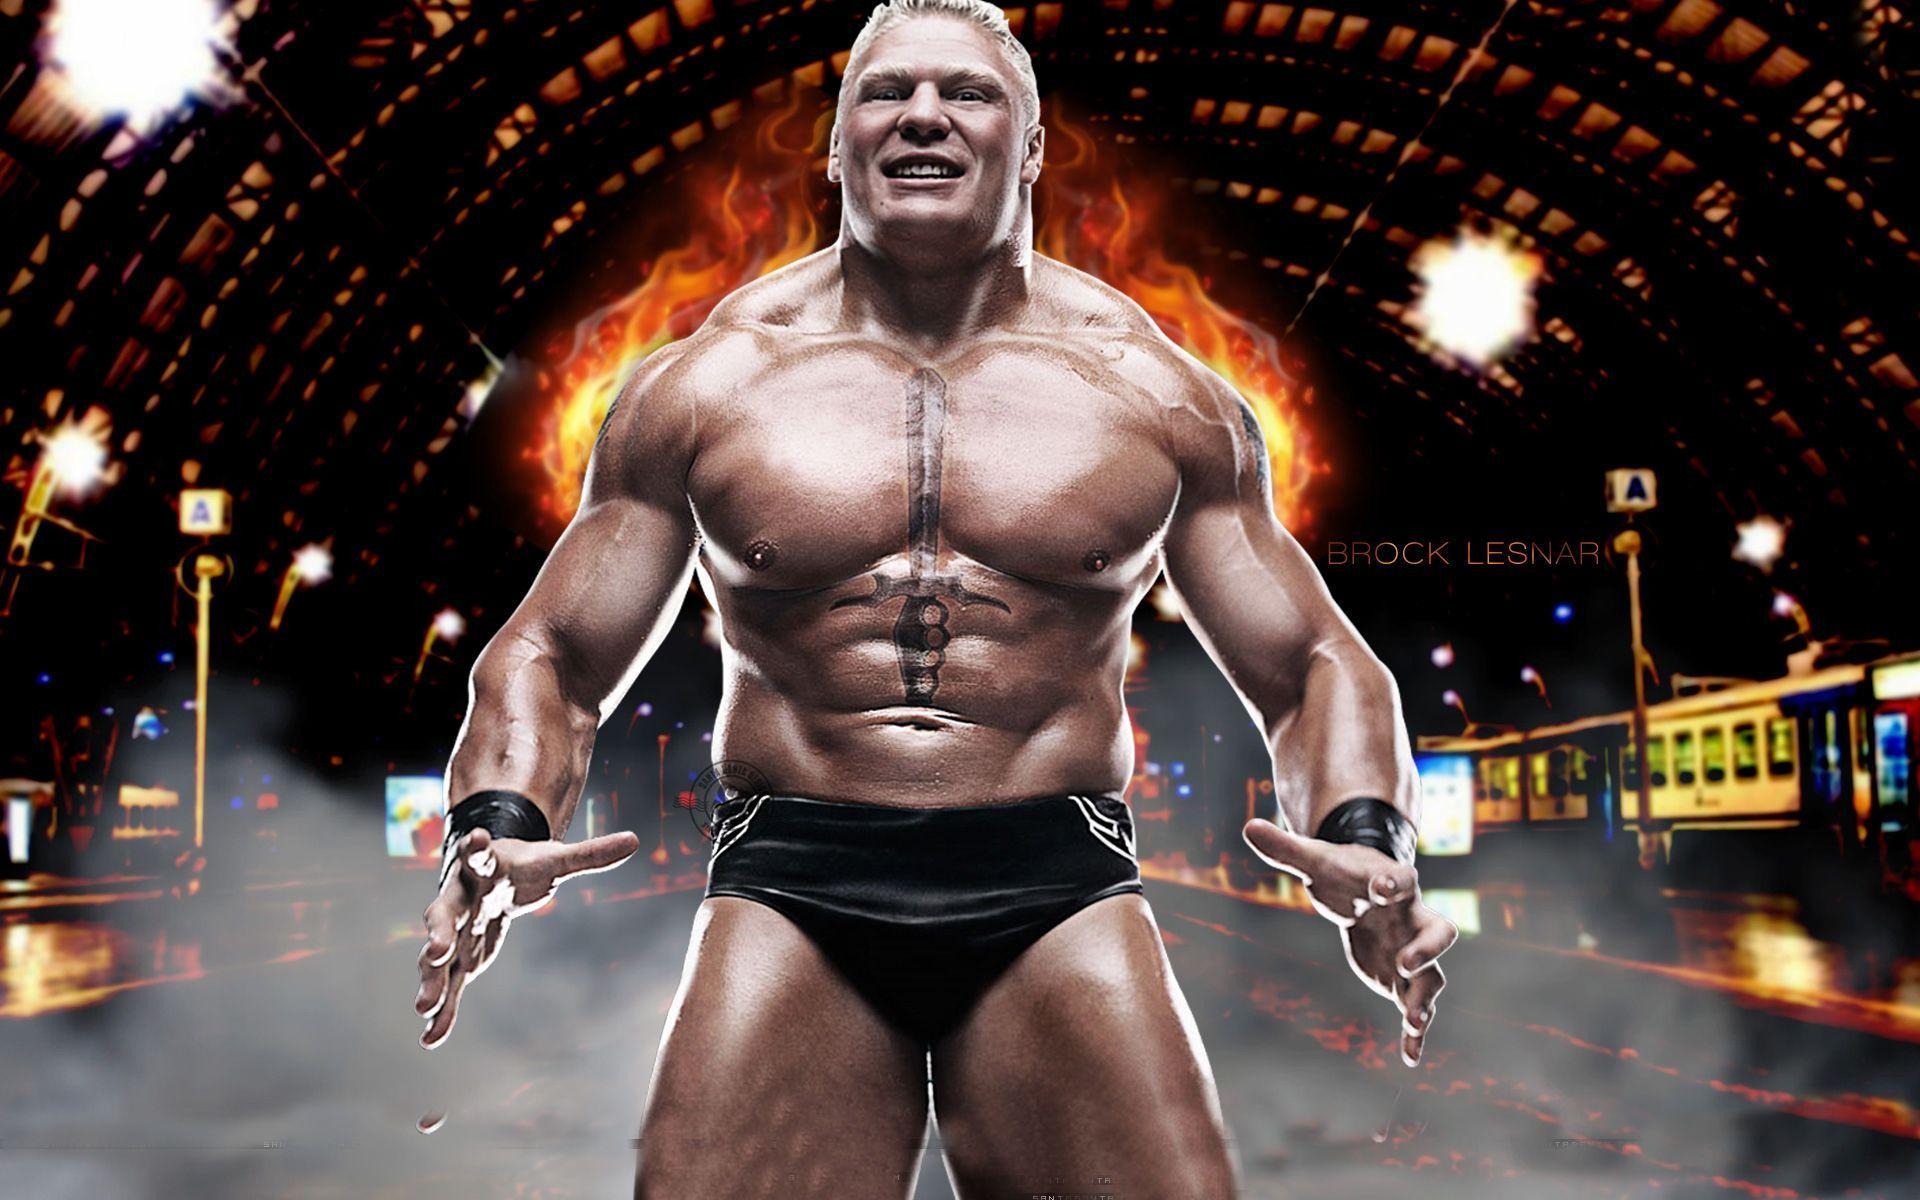 Brock Lesnar WWE 2016 Wallpapers 1024x768